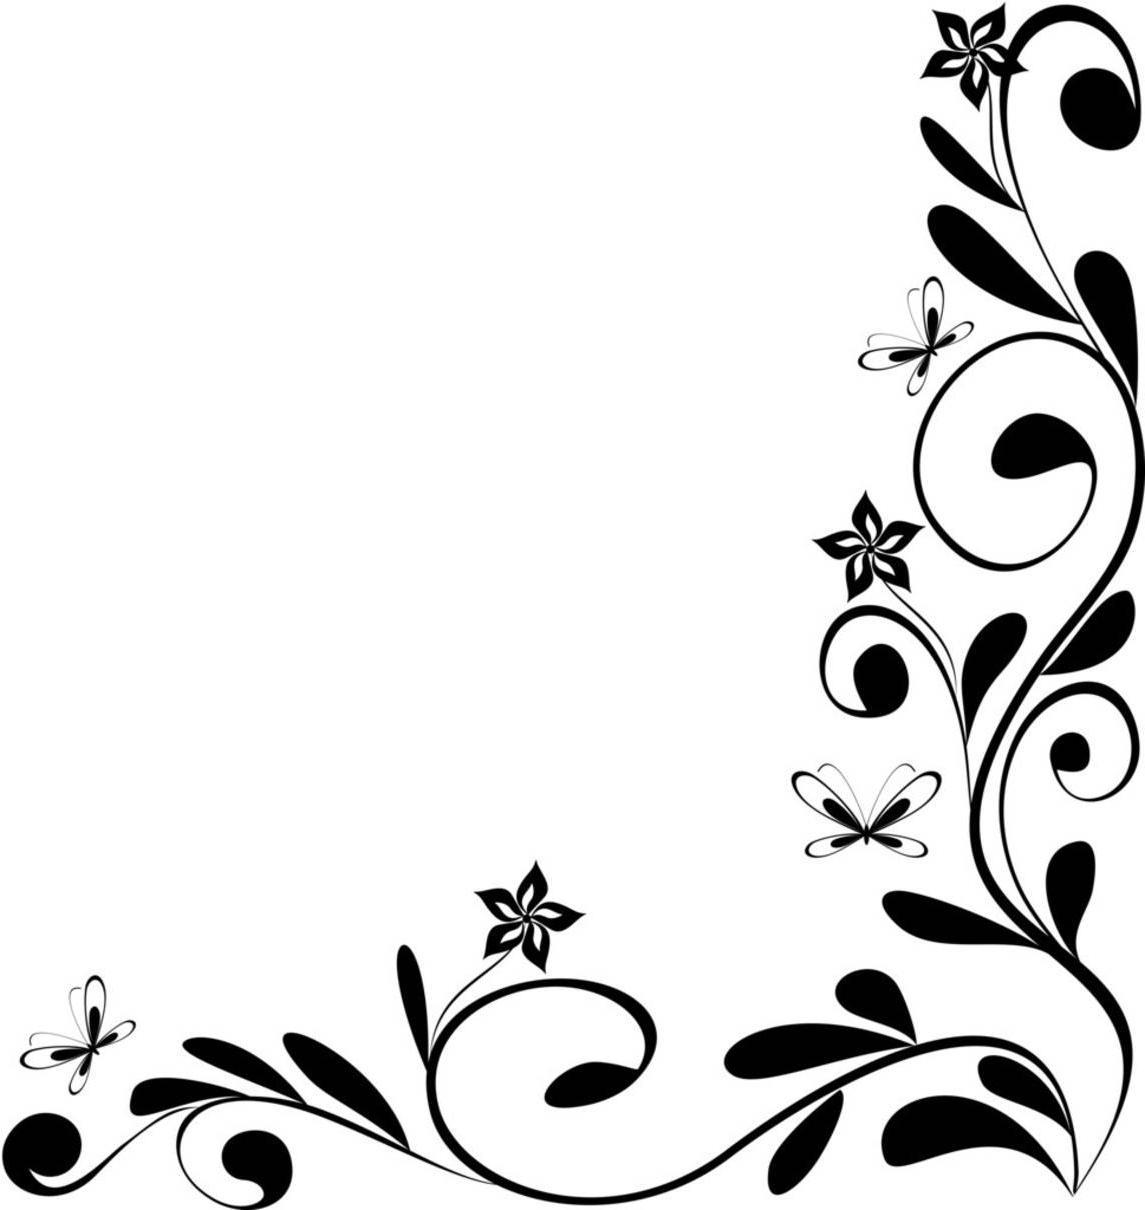 Leaf Border Clipart Black And White